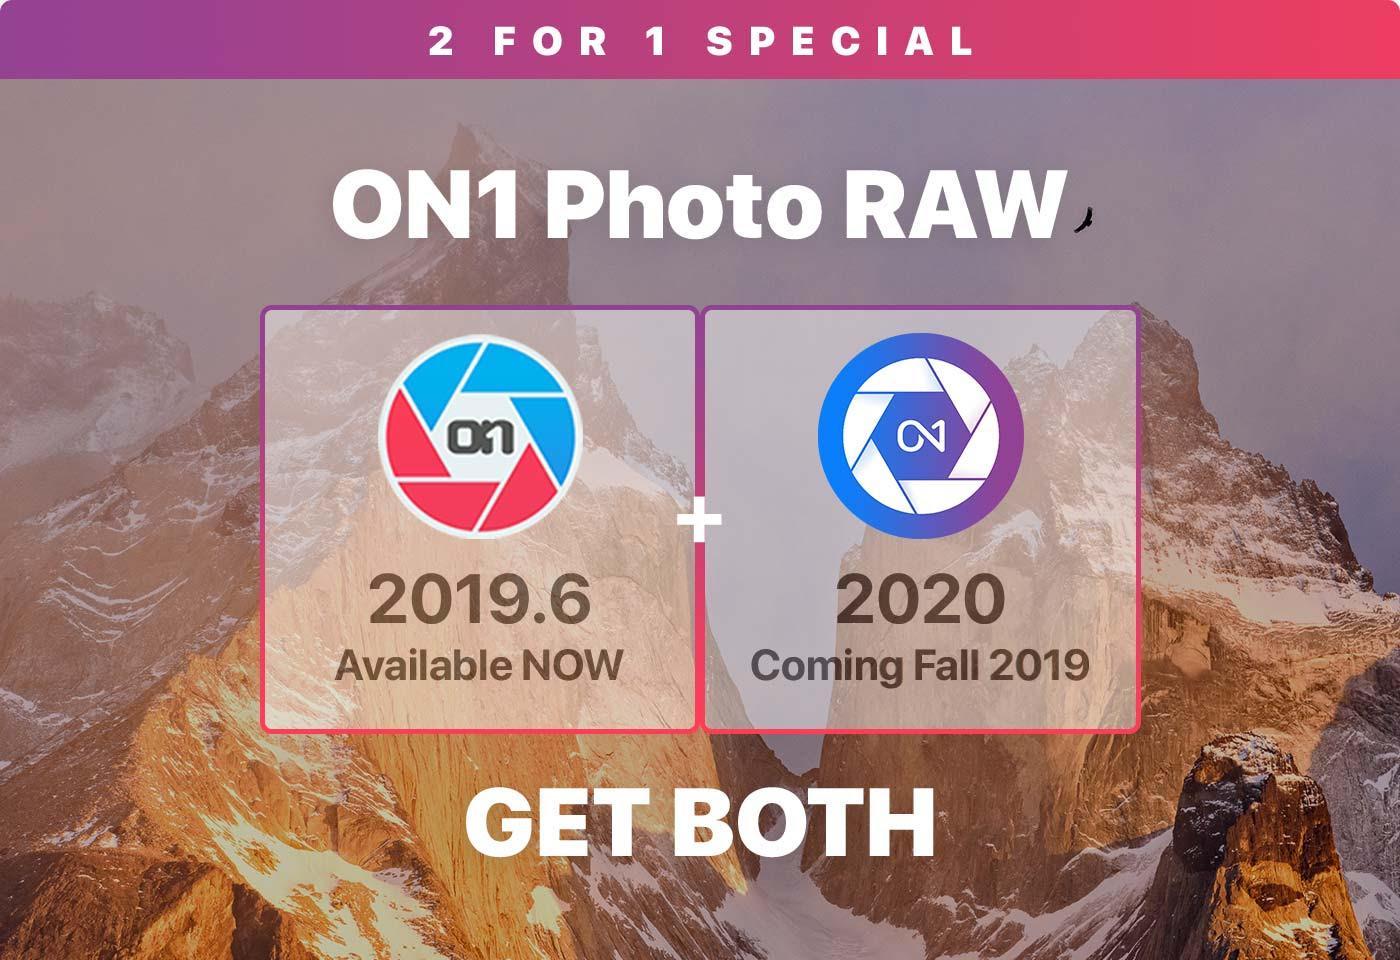 ON1 Photo RAW 2019.6 + ON1 Photo RAW 2020